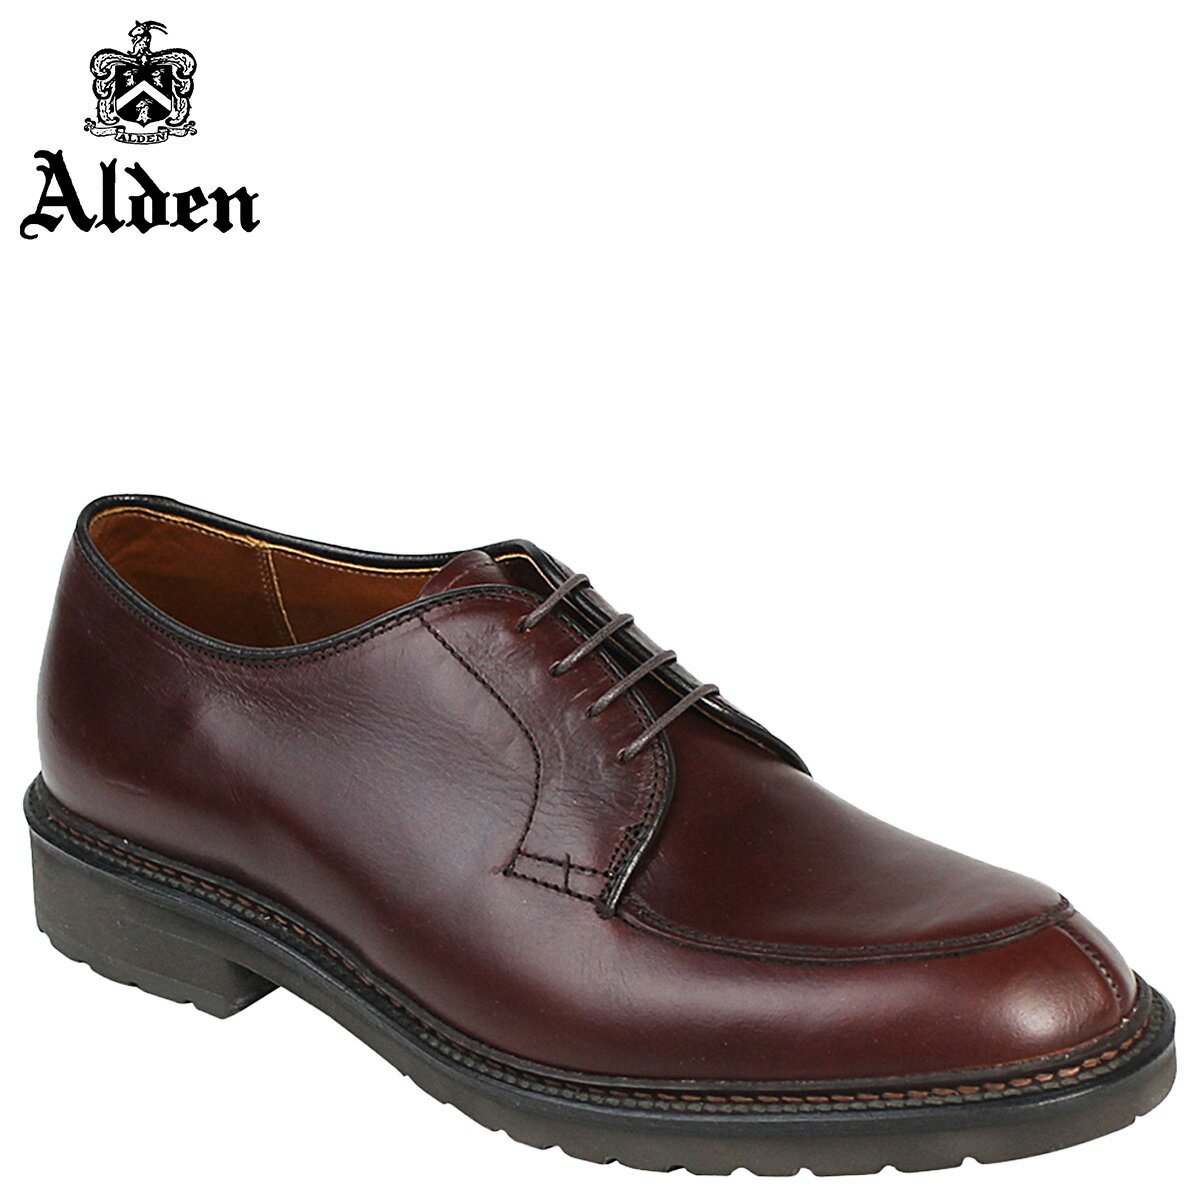 ALDEN オールデン シューズ メンズ MOCC TOE BLUCHER Dワイズ 7118S